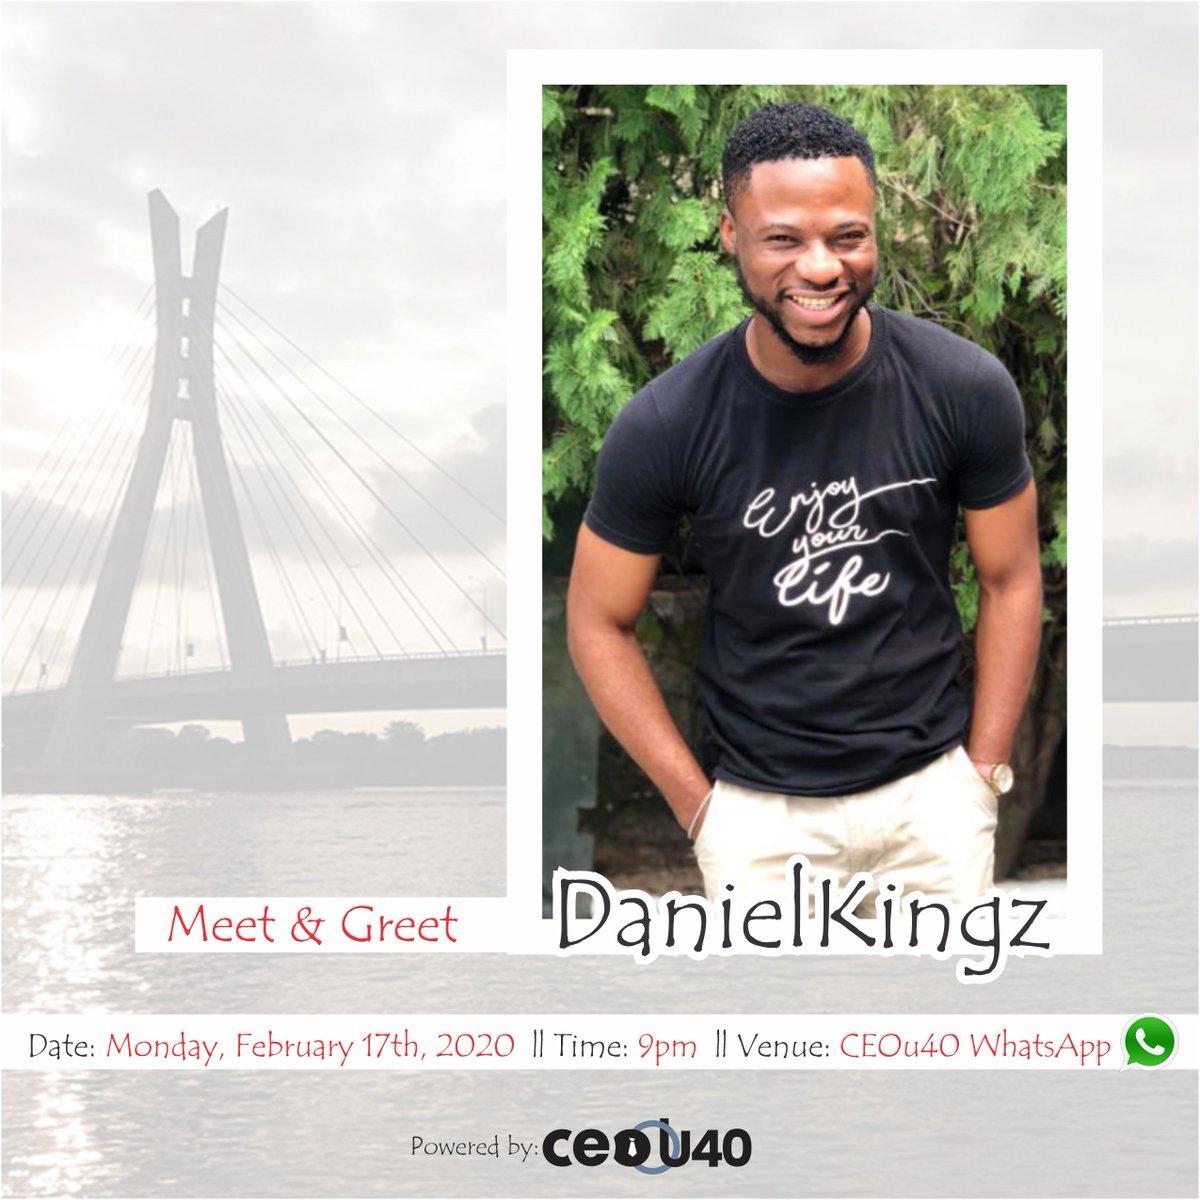 Meet of the CEO'  More details soon.  #ceou40 #ceo #socialmedia #business #society #money #marketingpic.twitter.com/NI2YLQ6v7b